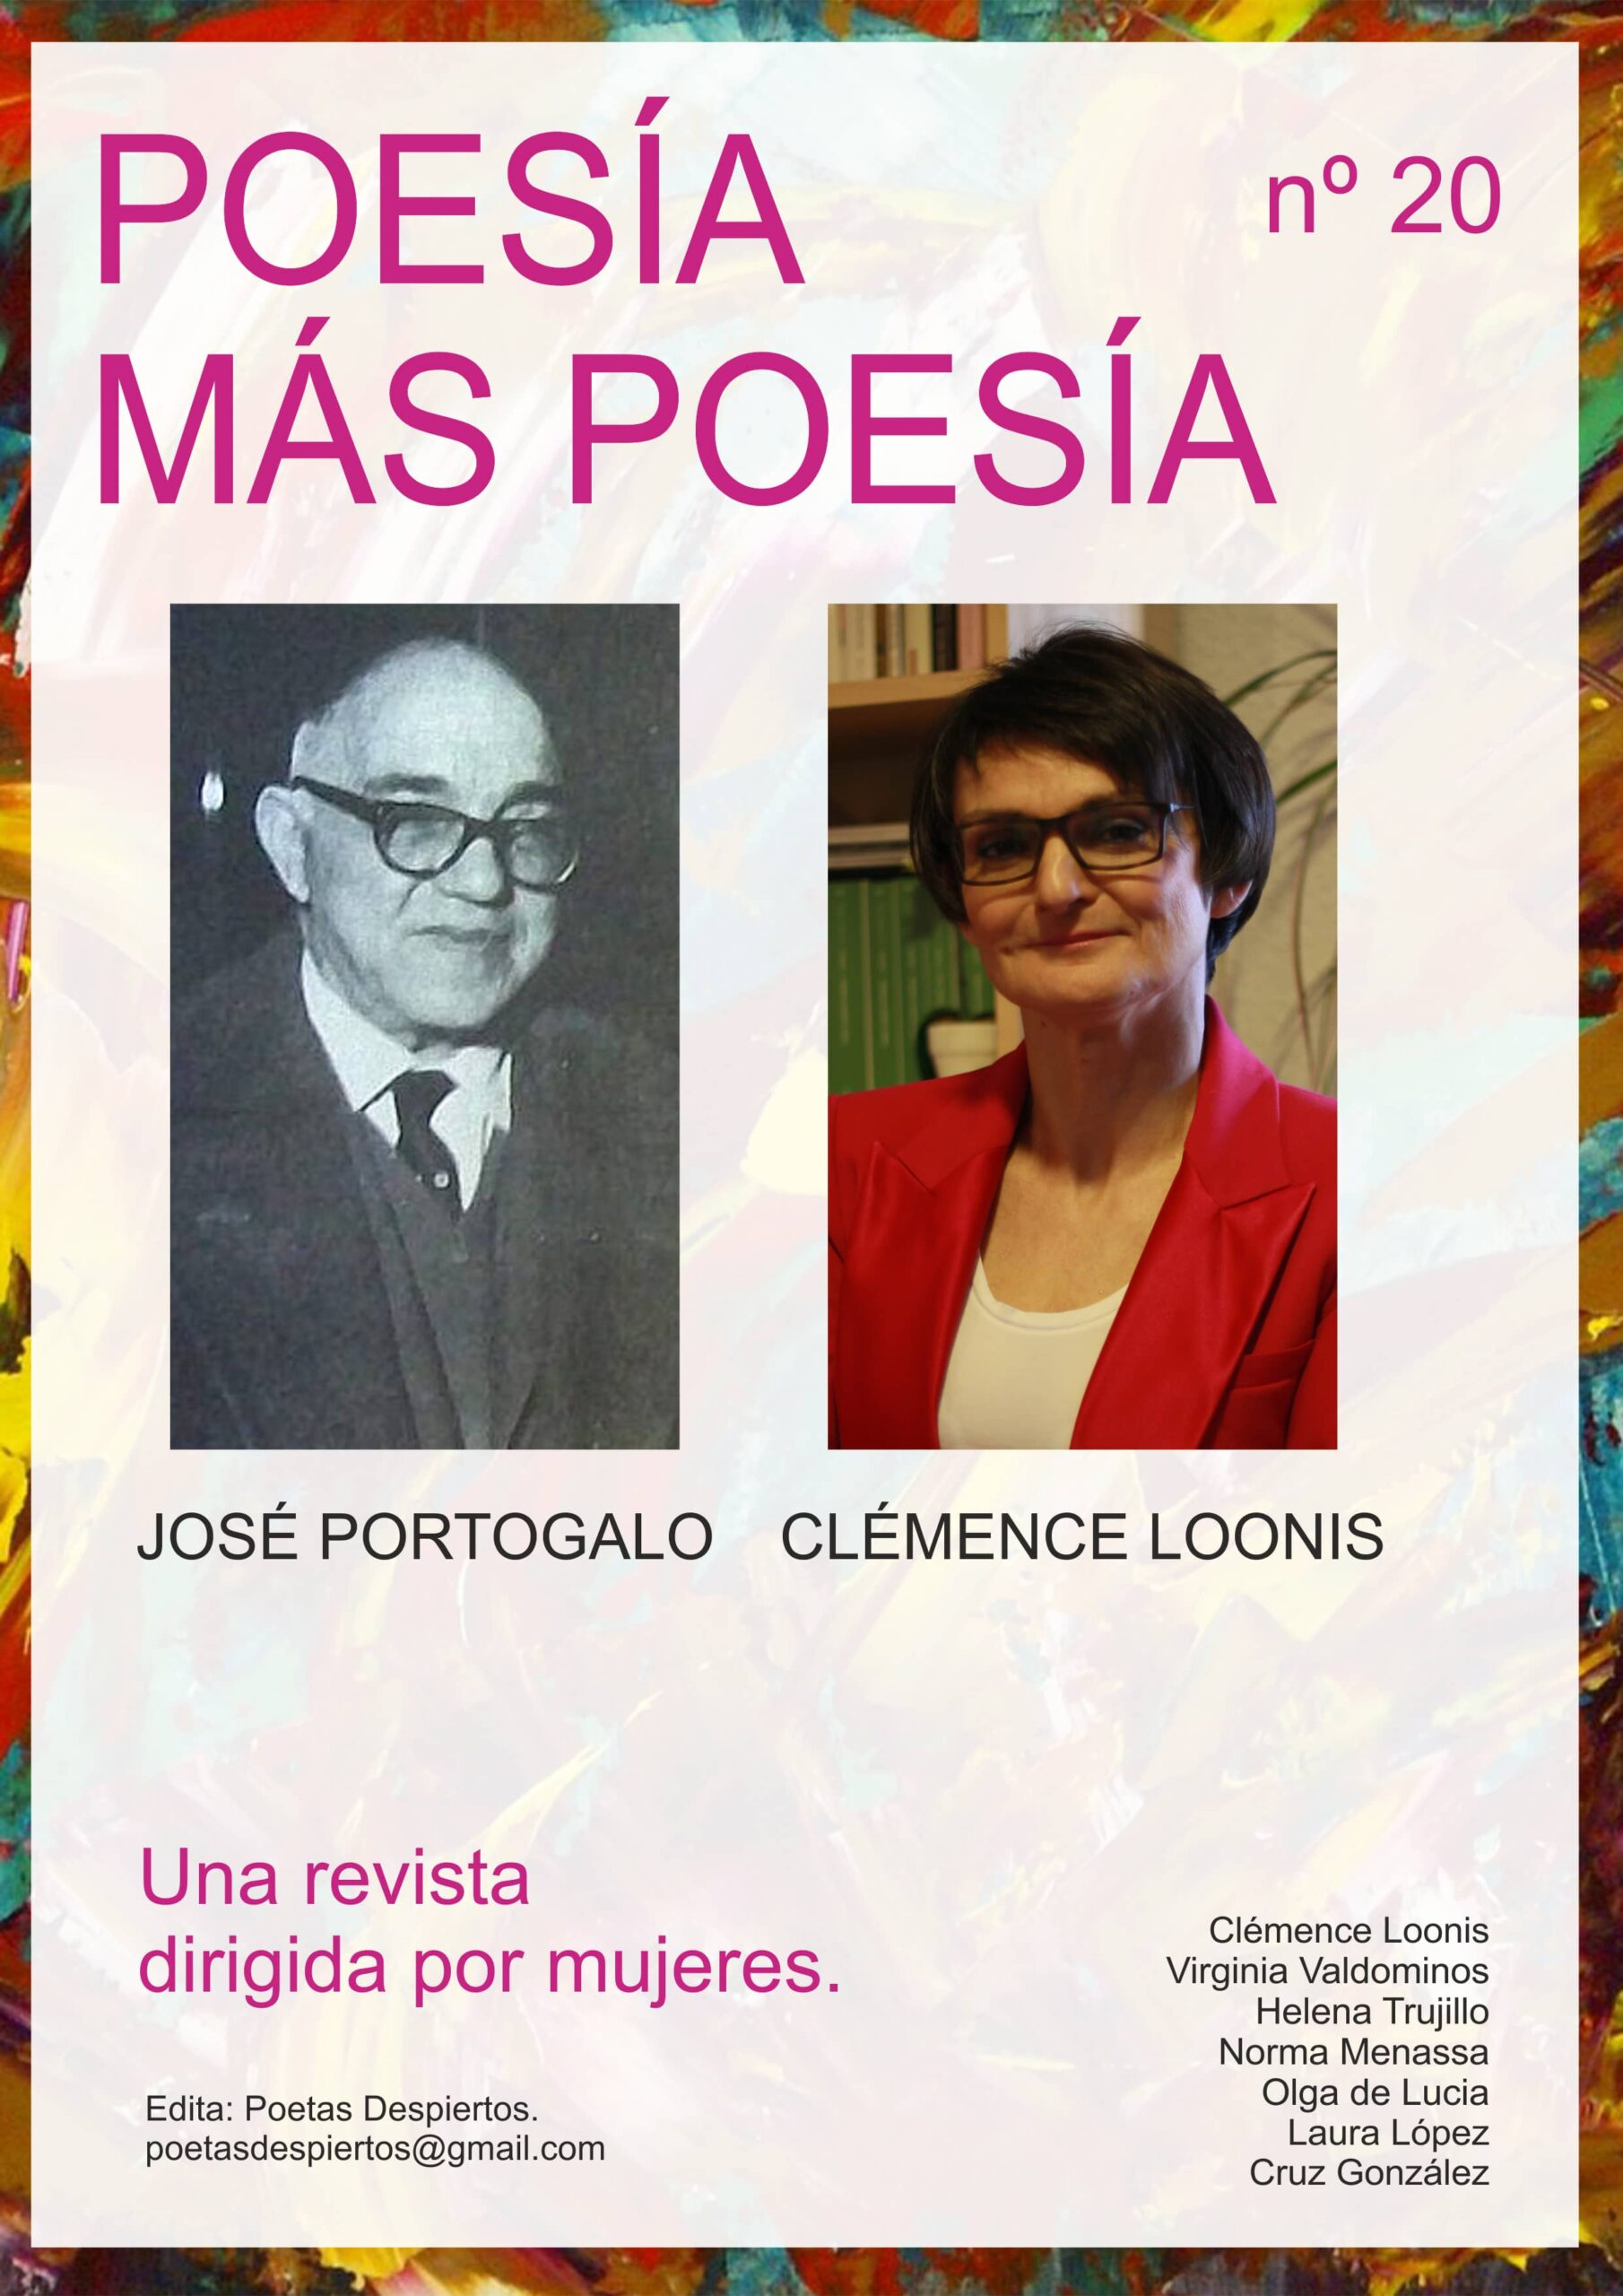 portogalo clemence Webp.net compress image scaled - Poesia Online